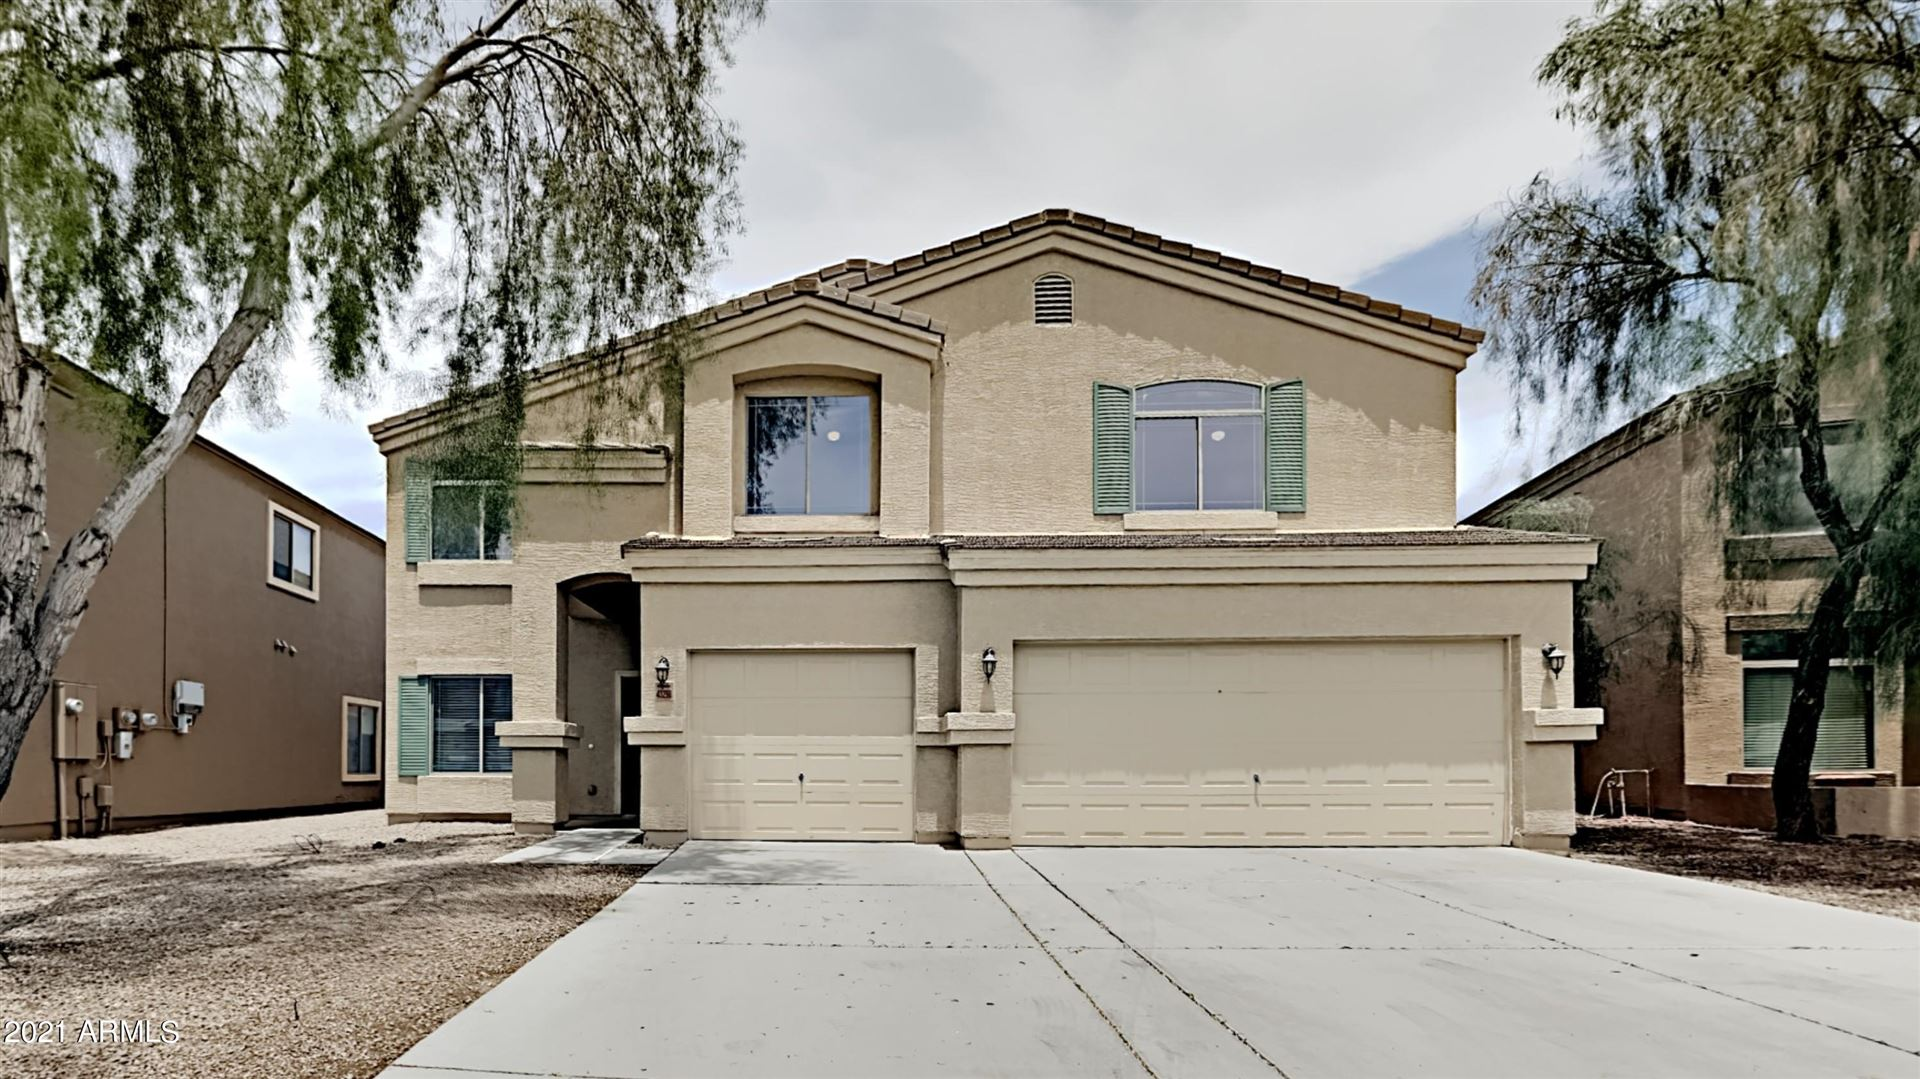 Photo for 43298 W ESTRADA Street, Maricopa, AZ 85138 (MLS # 6247895)